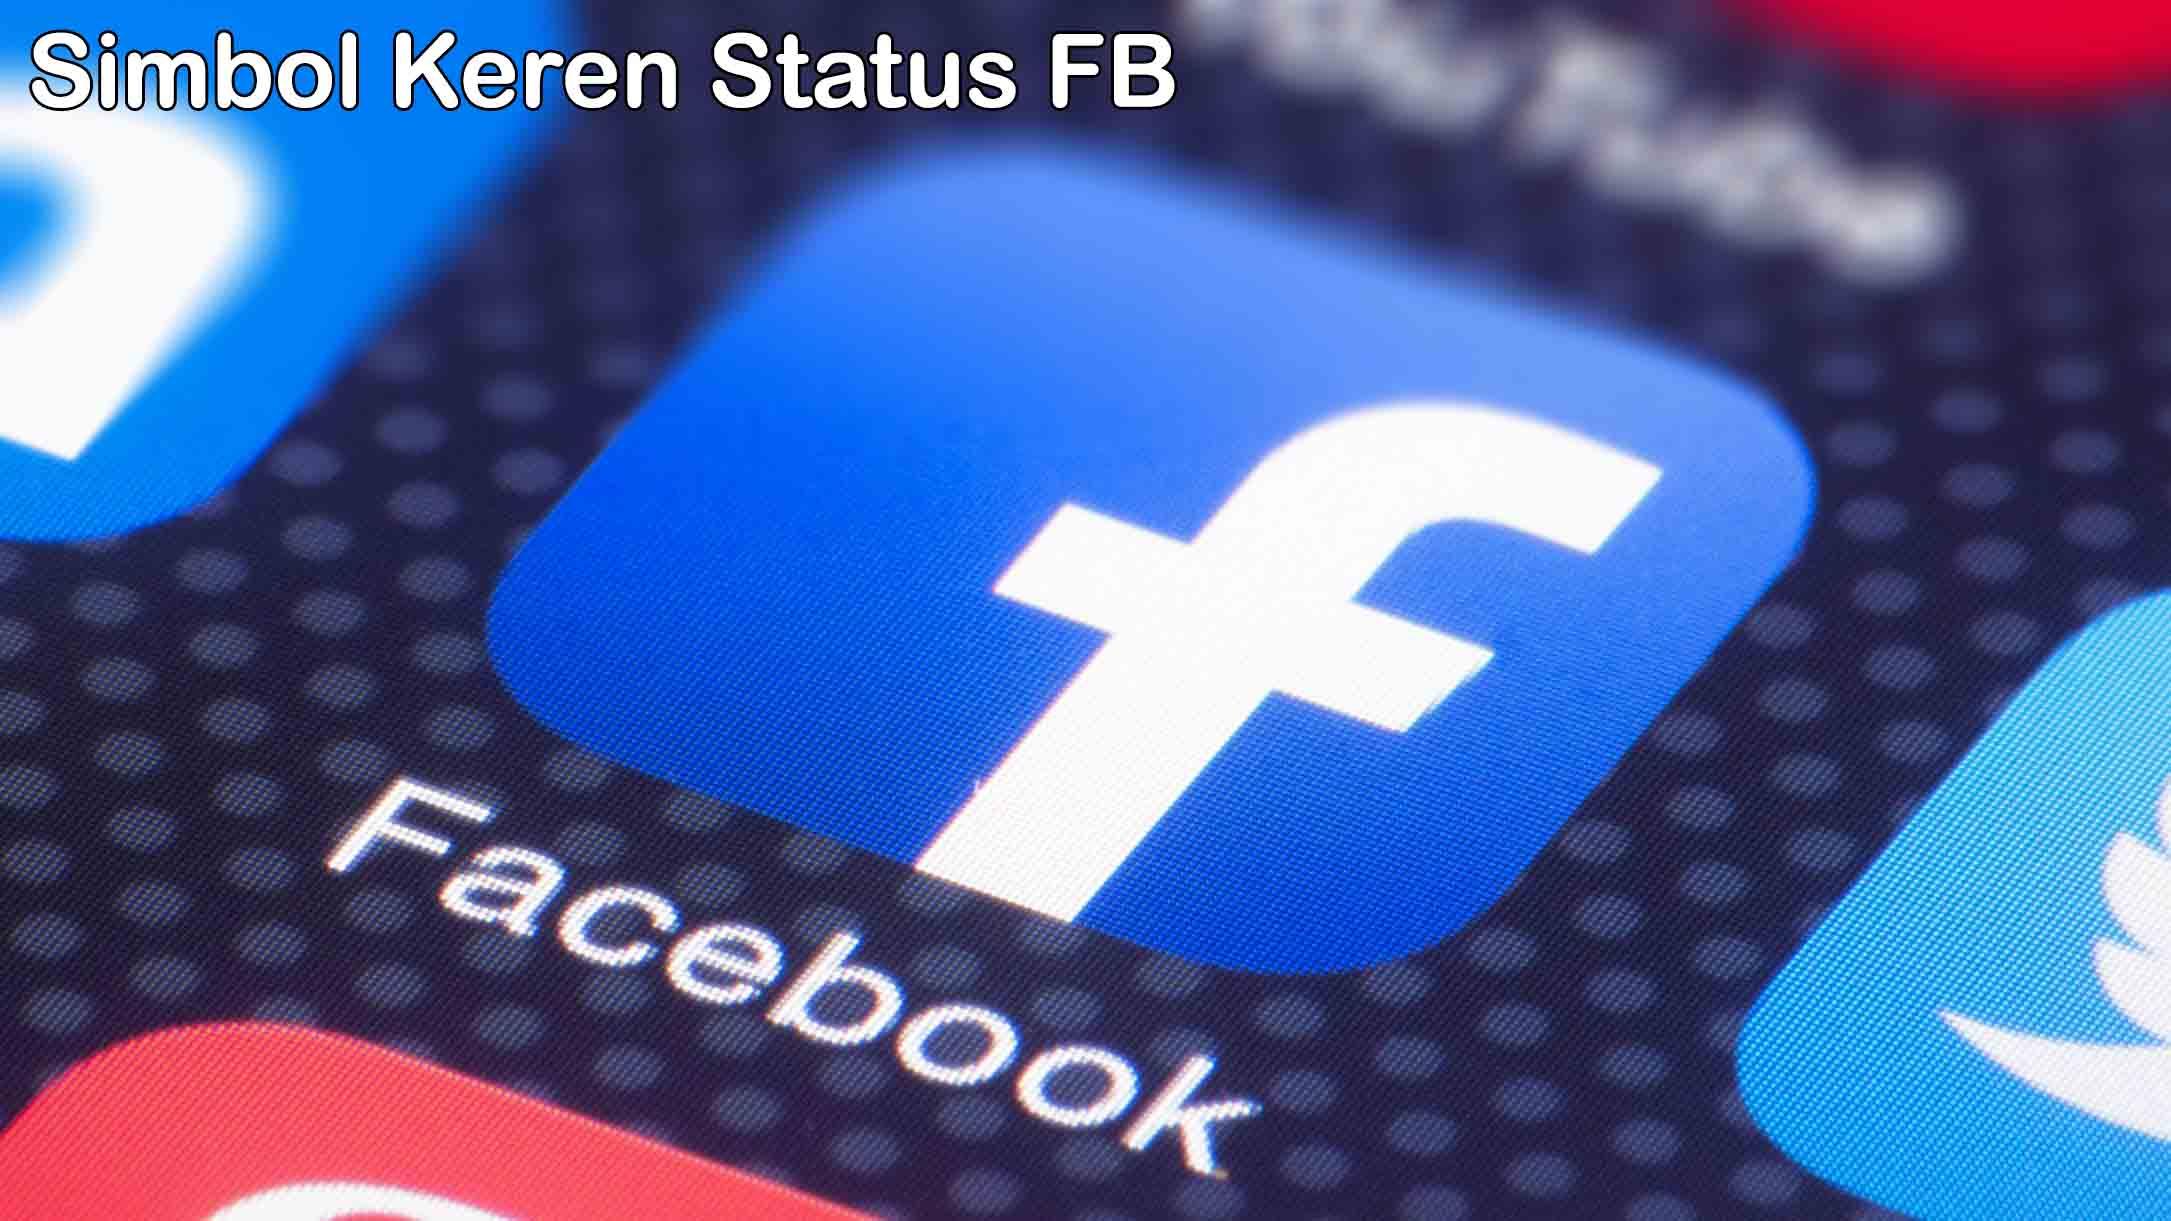 Simbol Keren Status Facebook